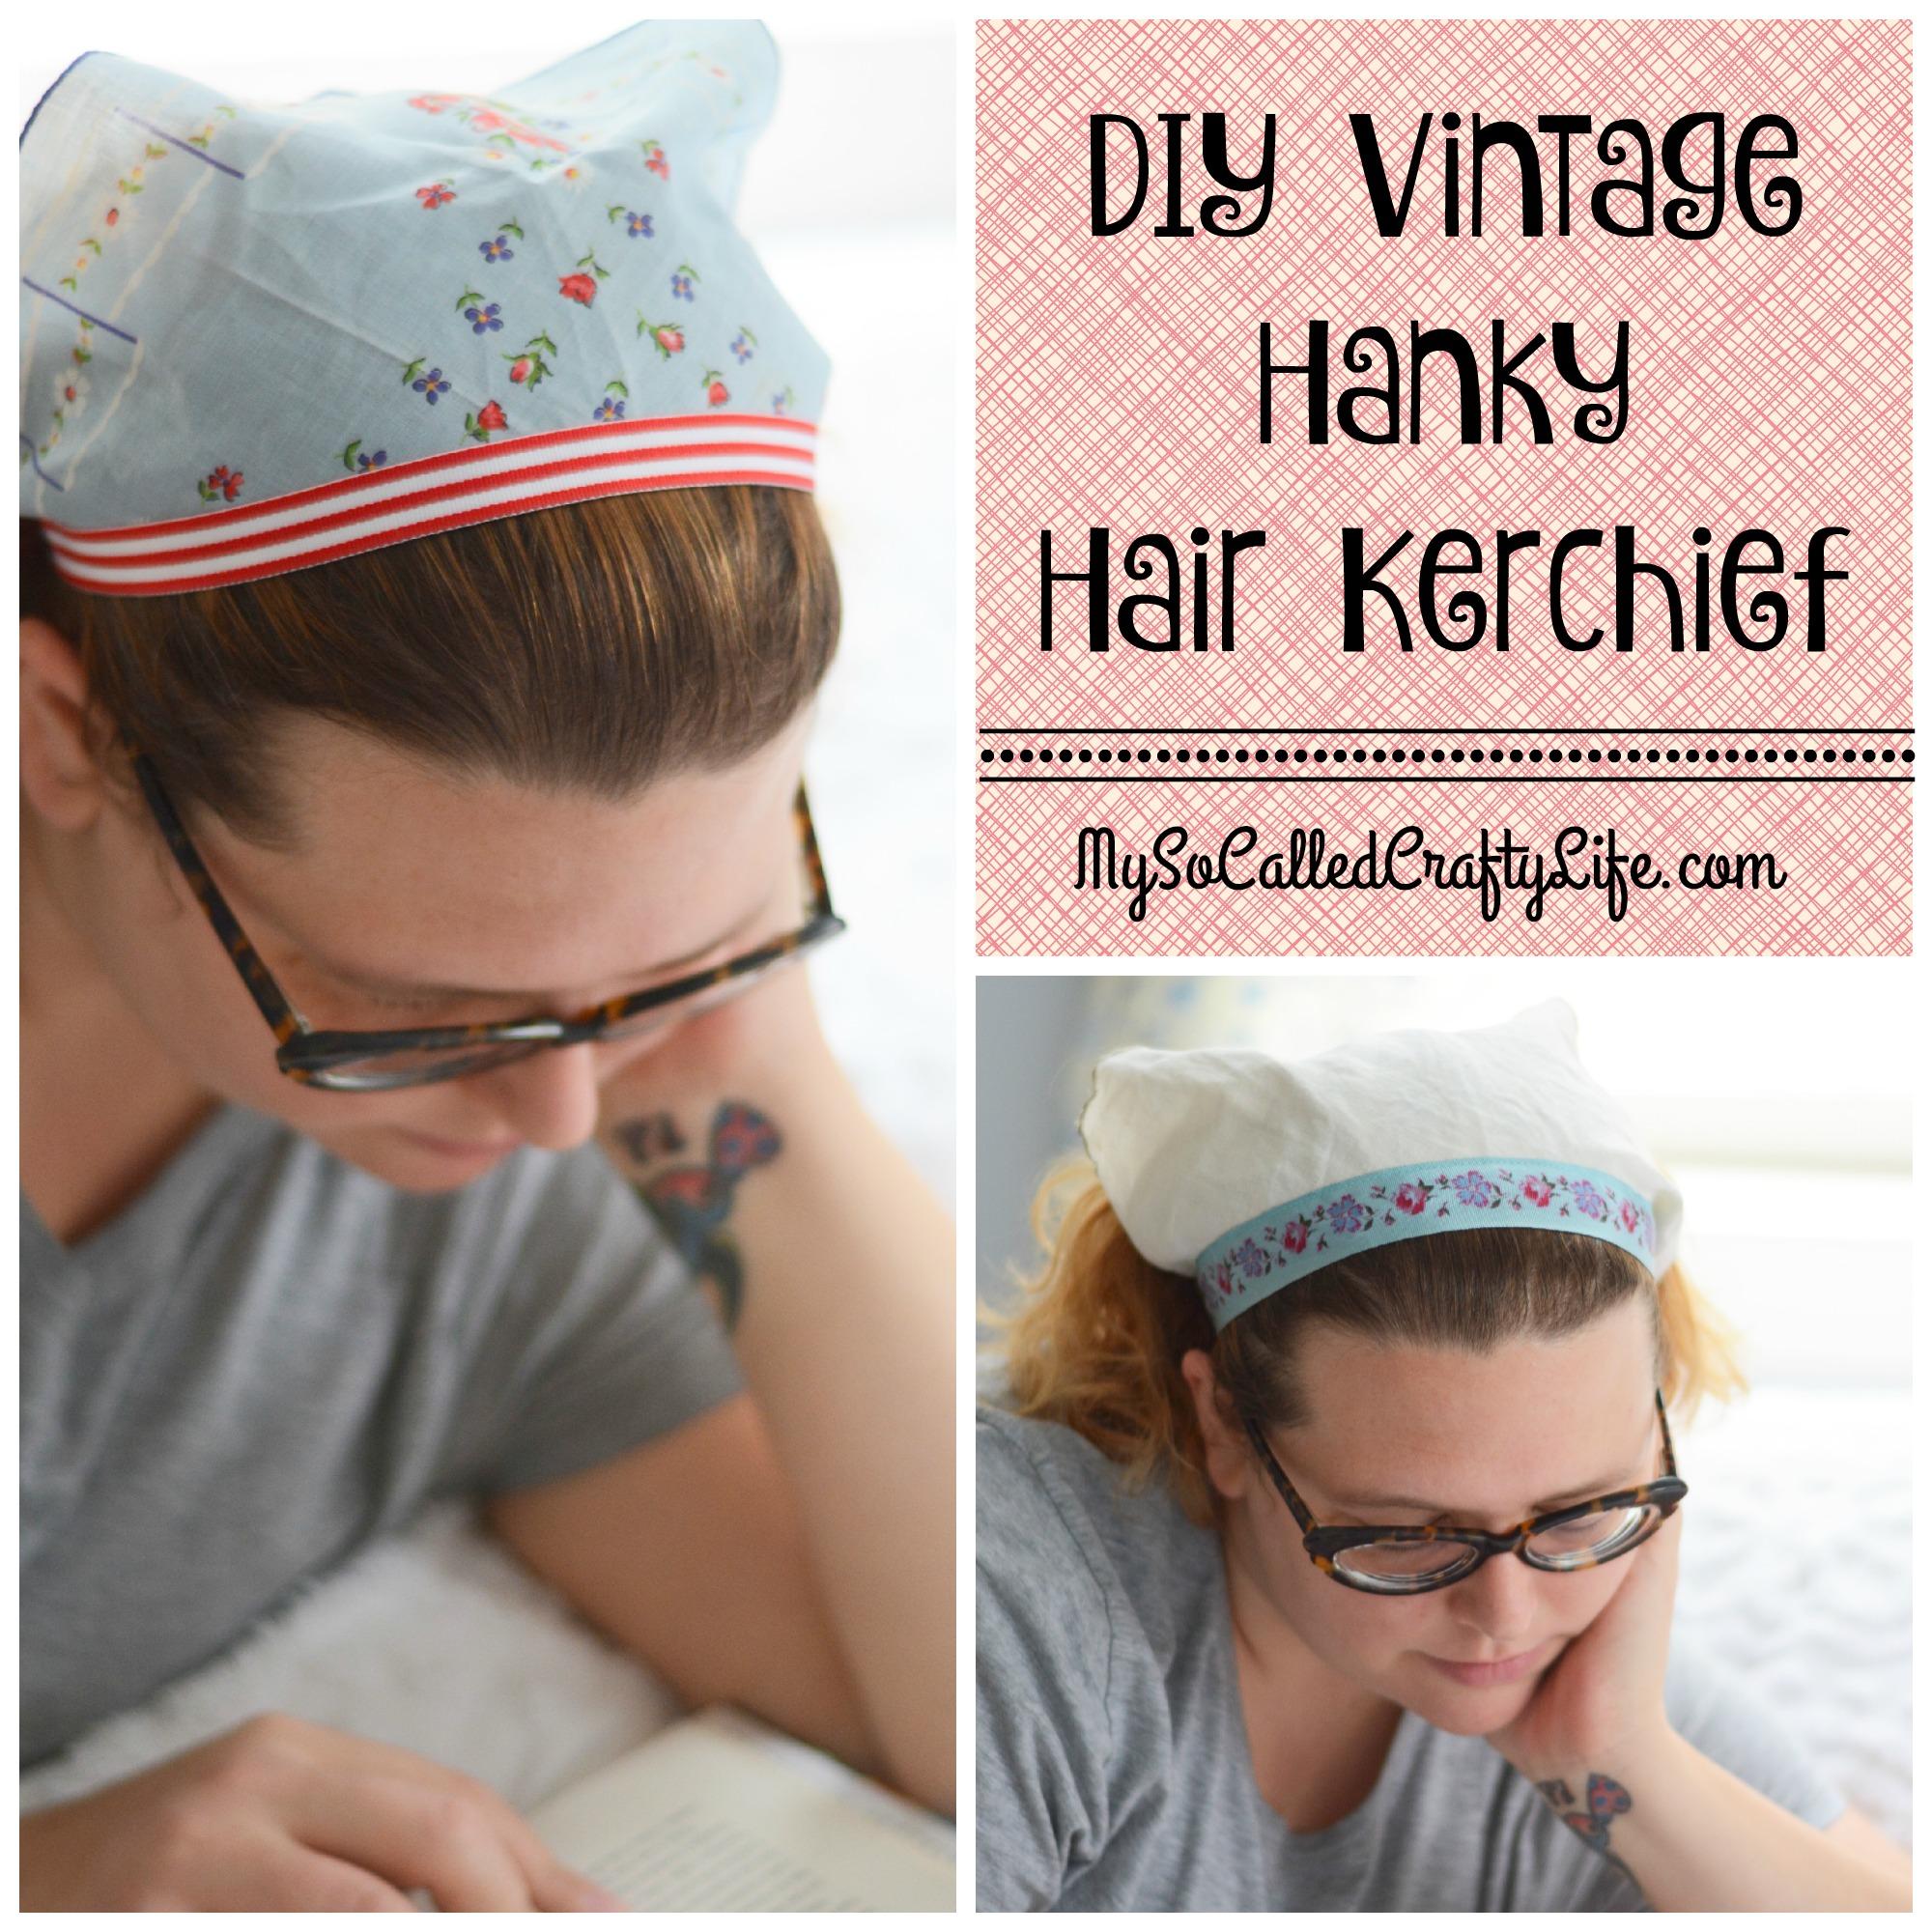 Kitschmas Gifts- DIY Vintage Hanky Hair Kerchief - My So Called ... 54a516cd063